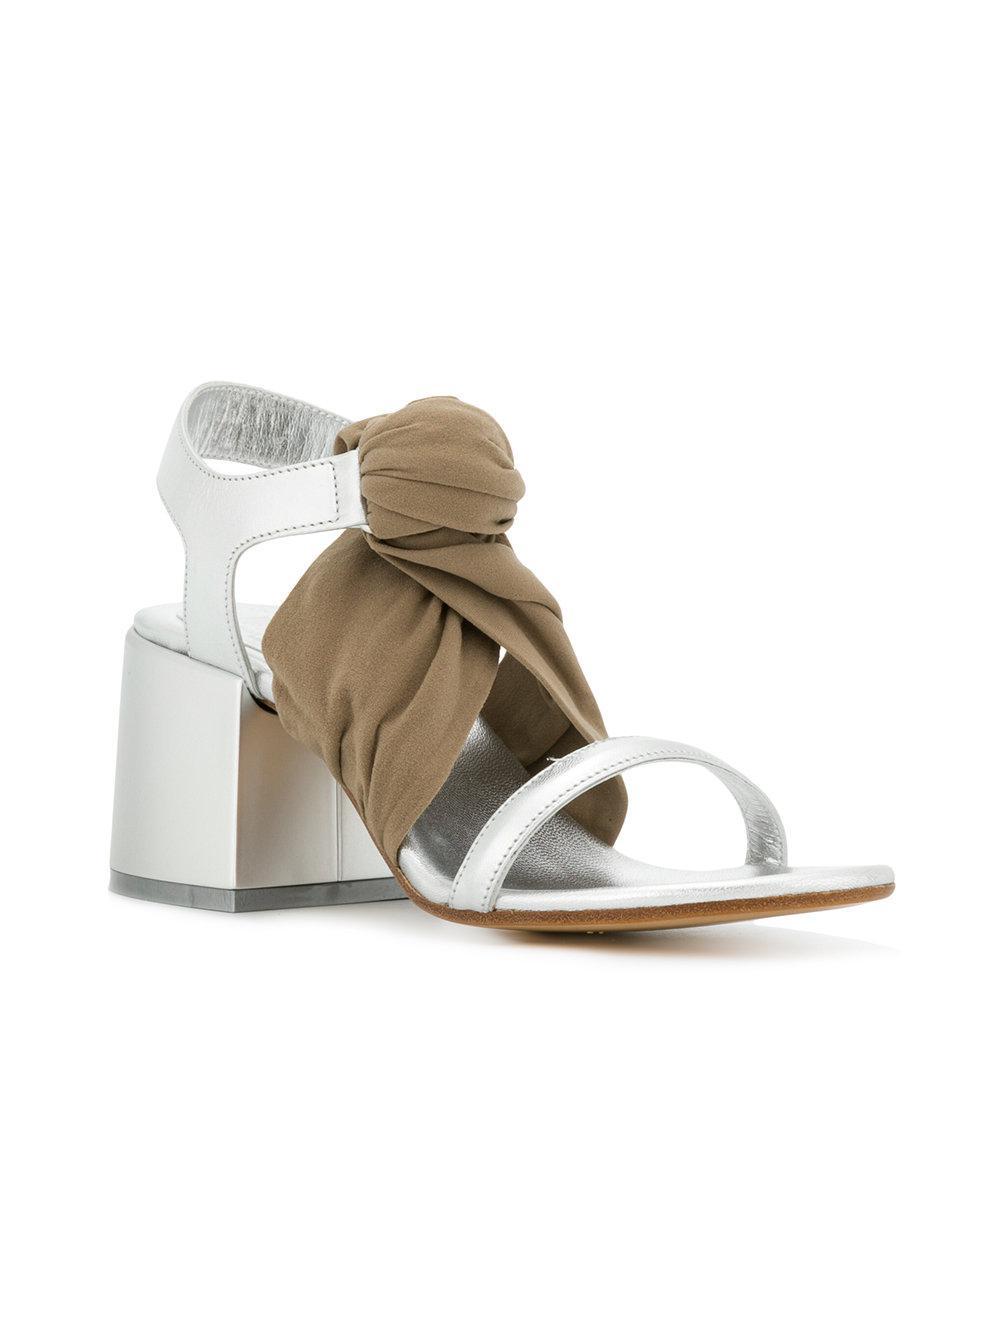 2c2f51e48c01 MM6 by Maison Martin Margiela Stocking Block Heel Sandals in Metallic - Lyst